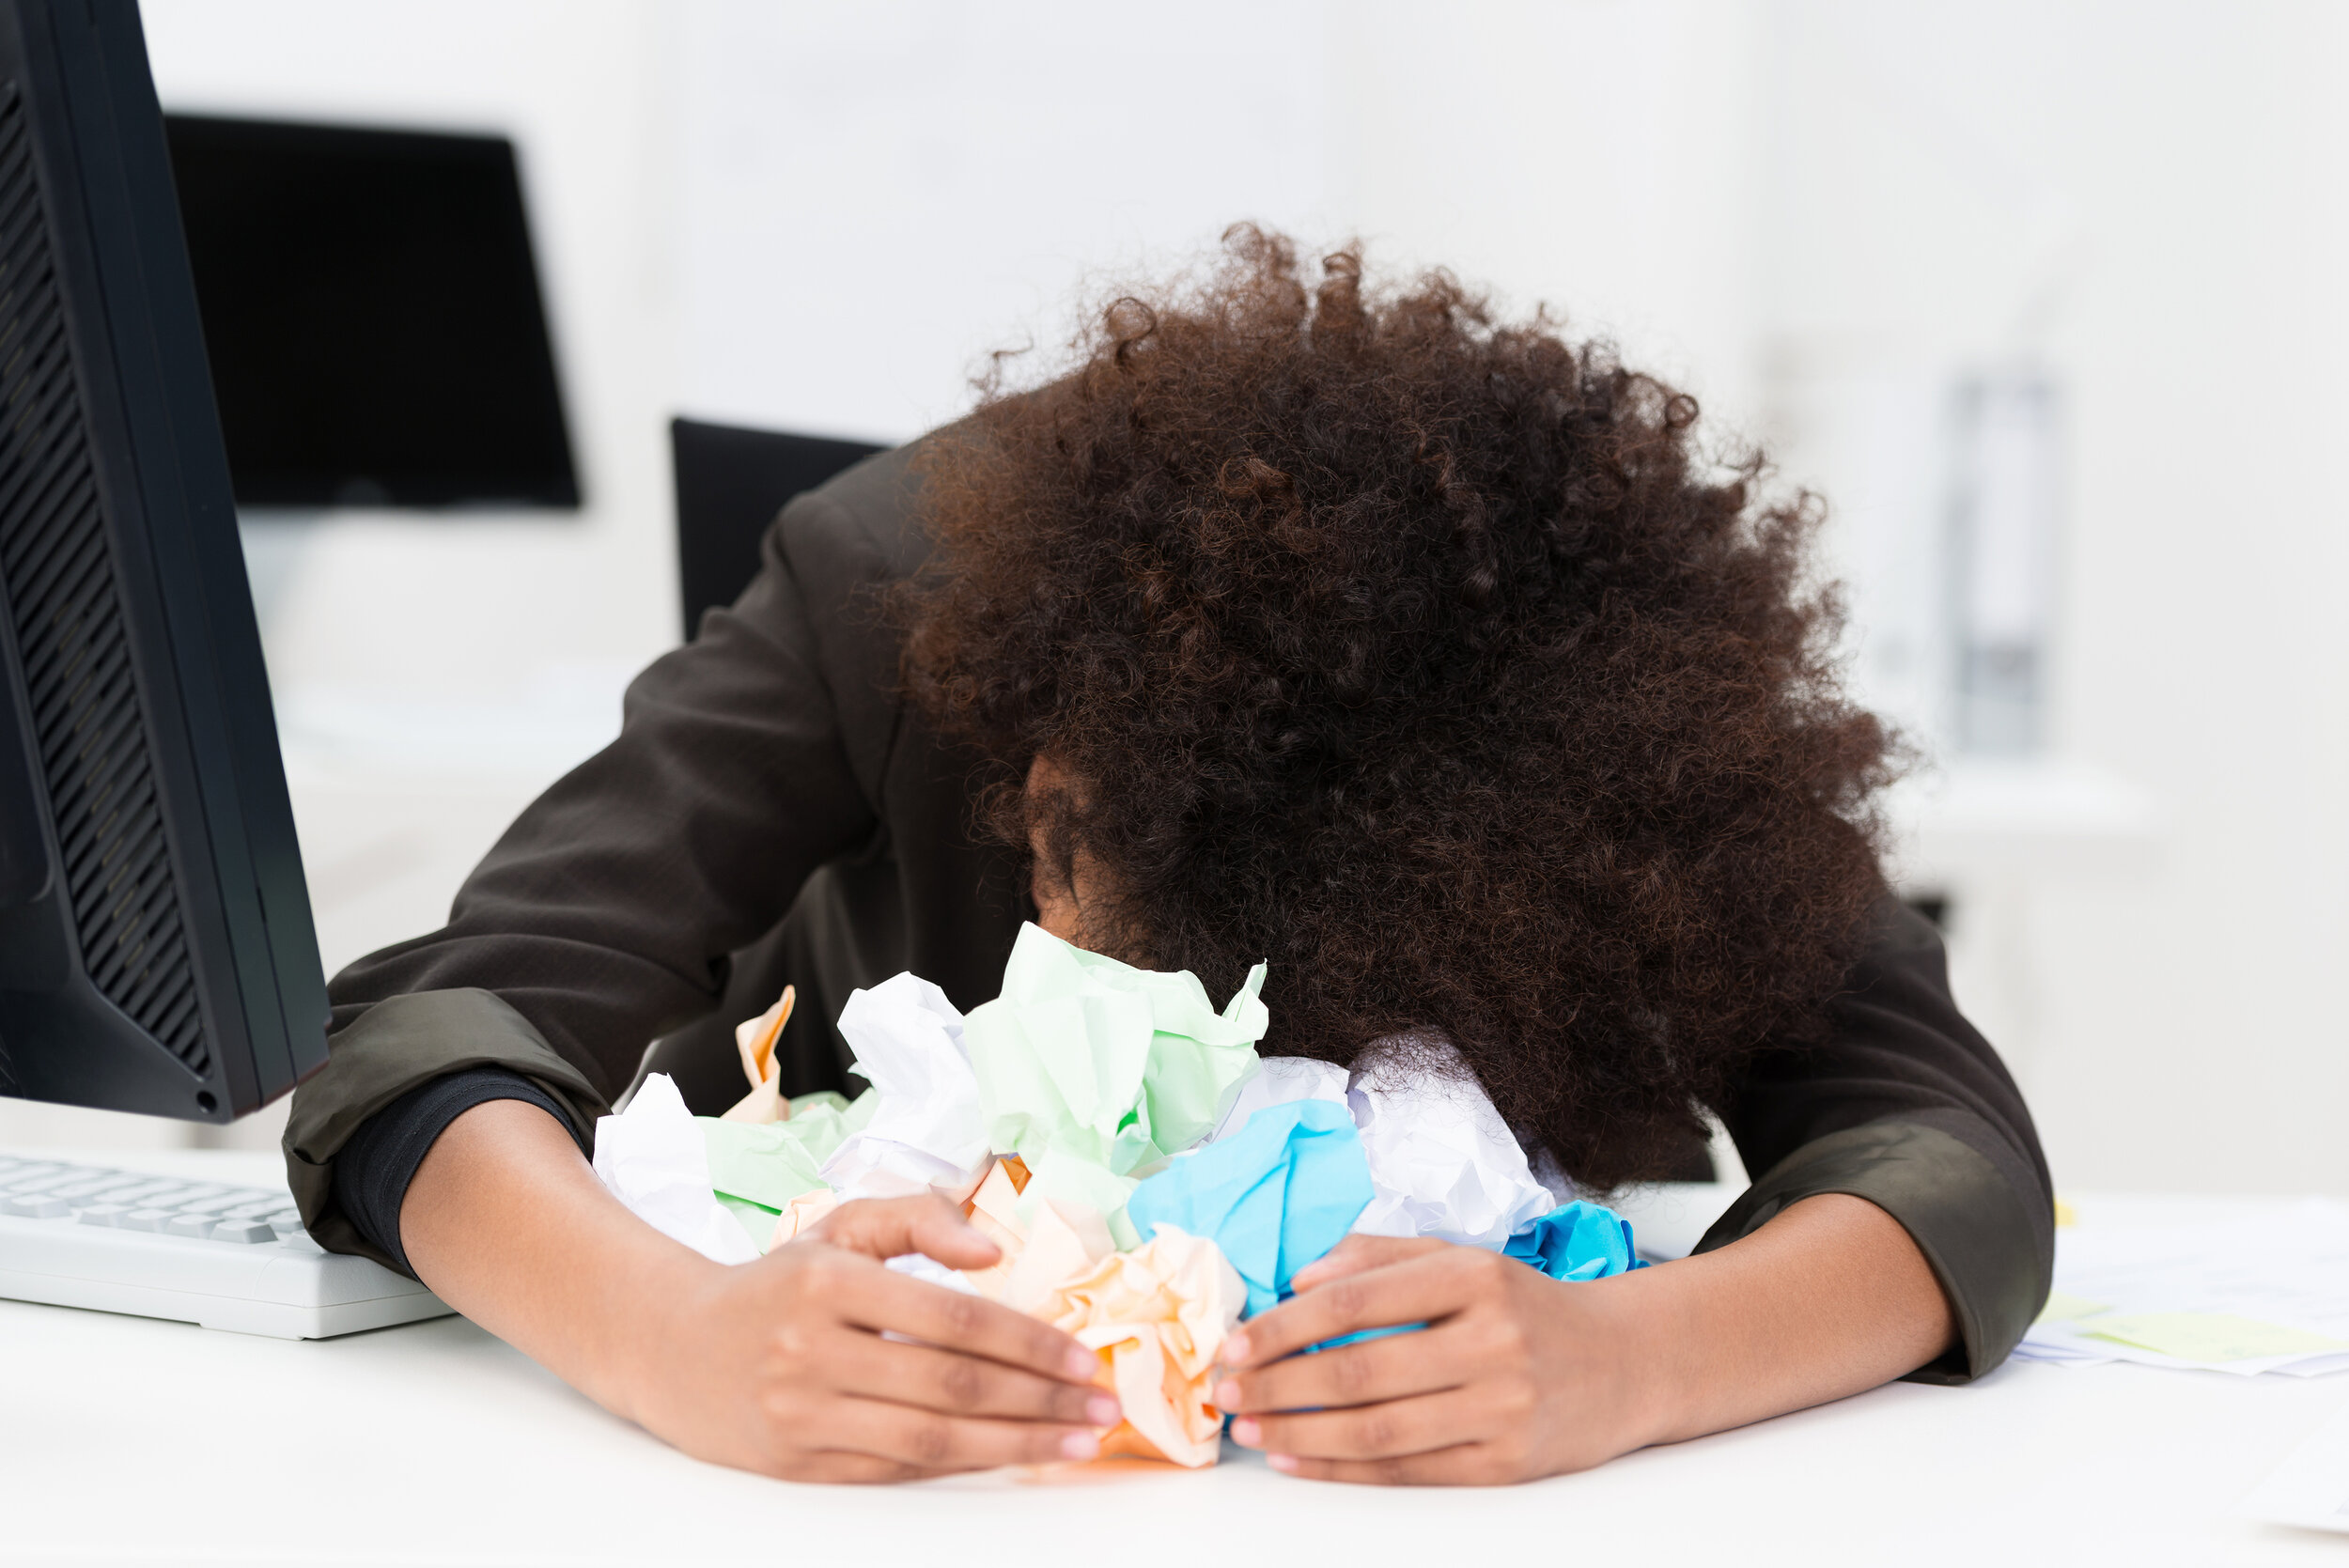 bigstock-Distraught-Writer-Or-Businessw-57715154.jpg